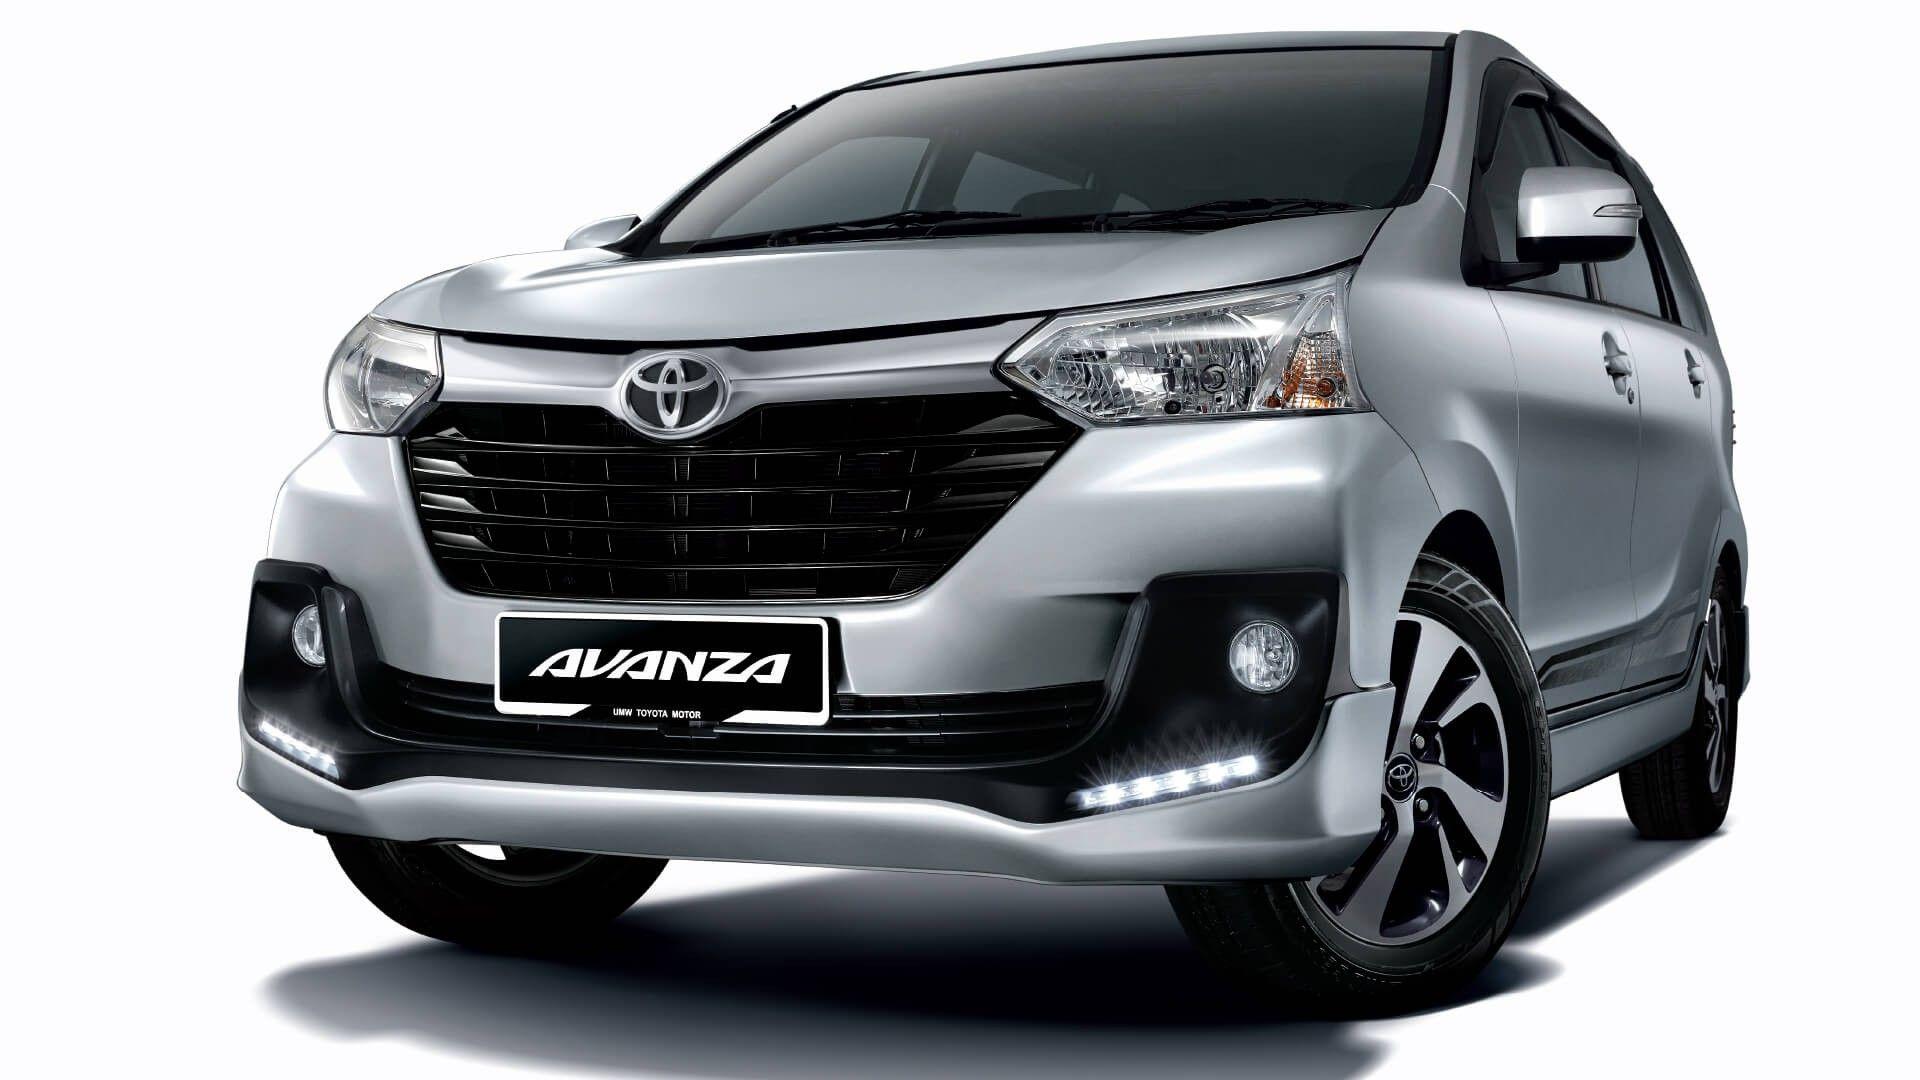 harga grand new avanza di jogja konsumsi bahan bakar all kijang innova toyota 2019 release date car 2018 pinterest yogyakarta